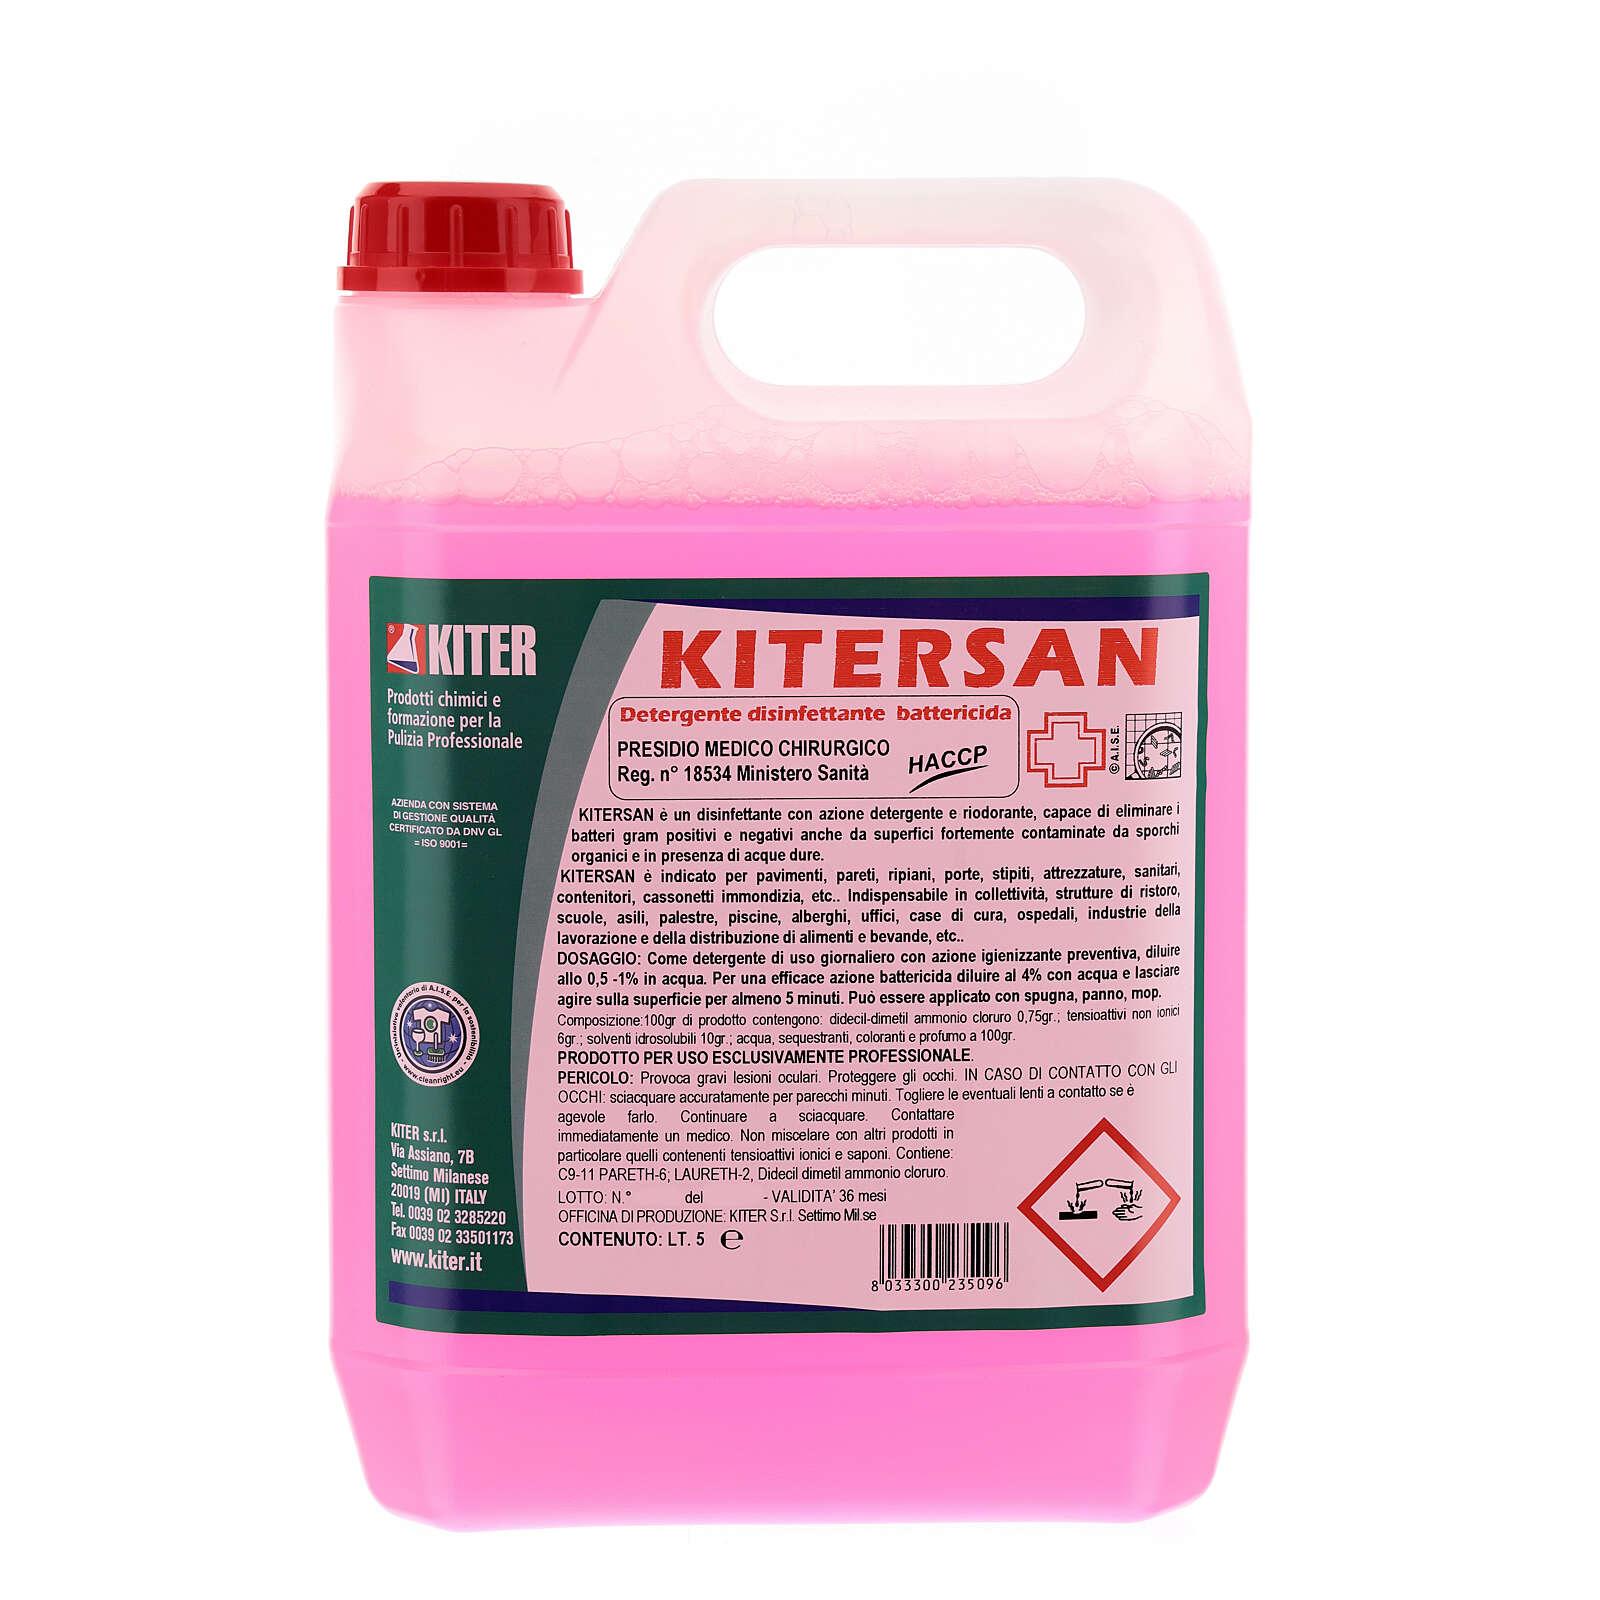 Detergente desinfetante antibacteriano Kitersan, galões de 5 litros 3